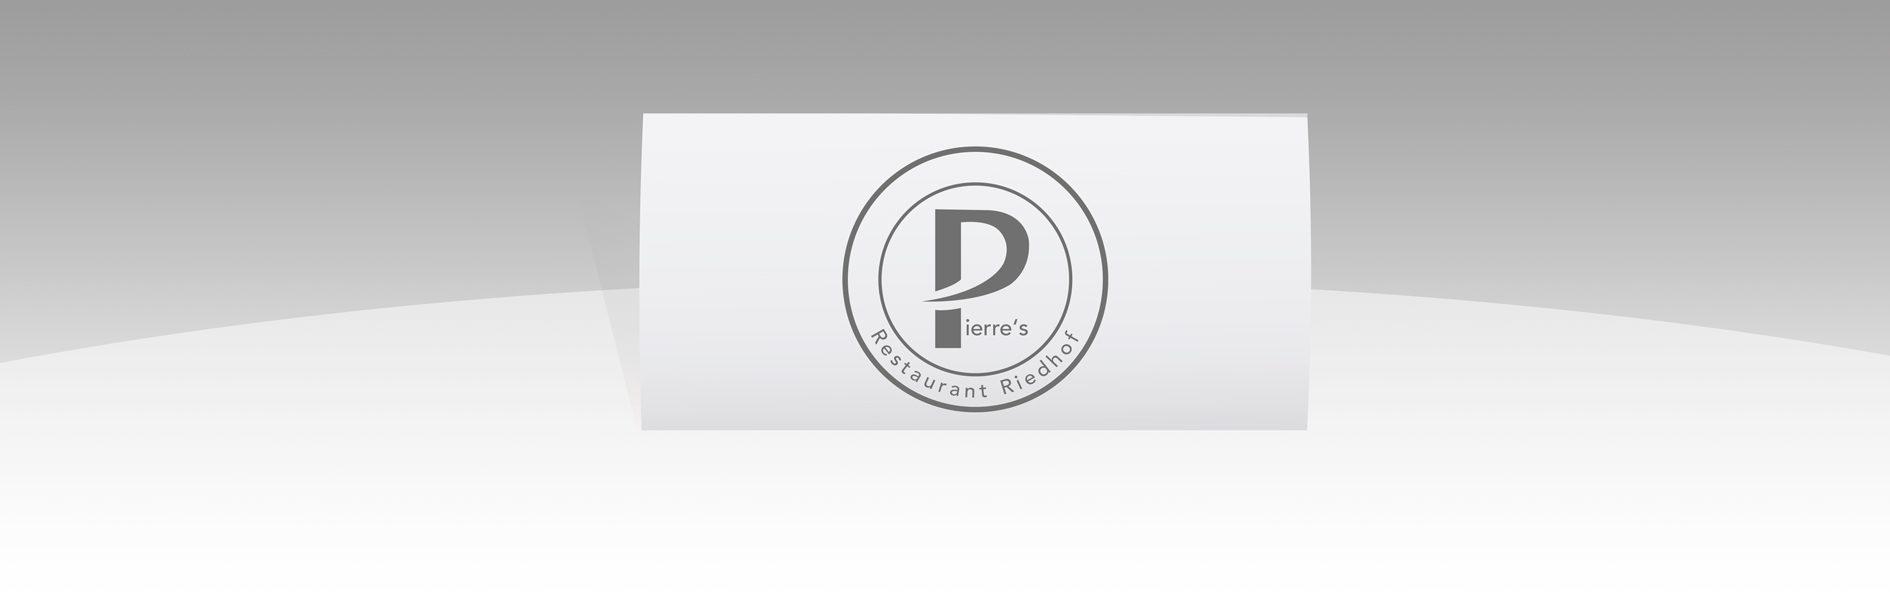 Logodesign Pierres Restaurant Riedhof